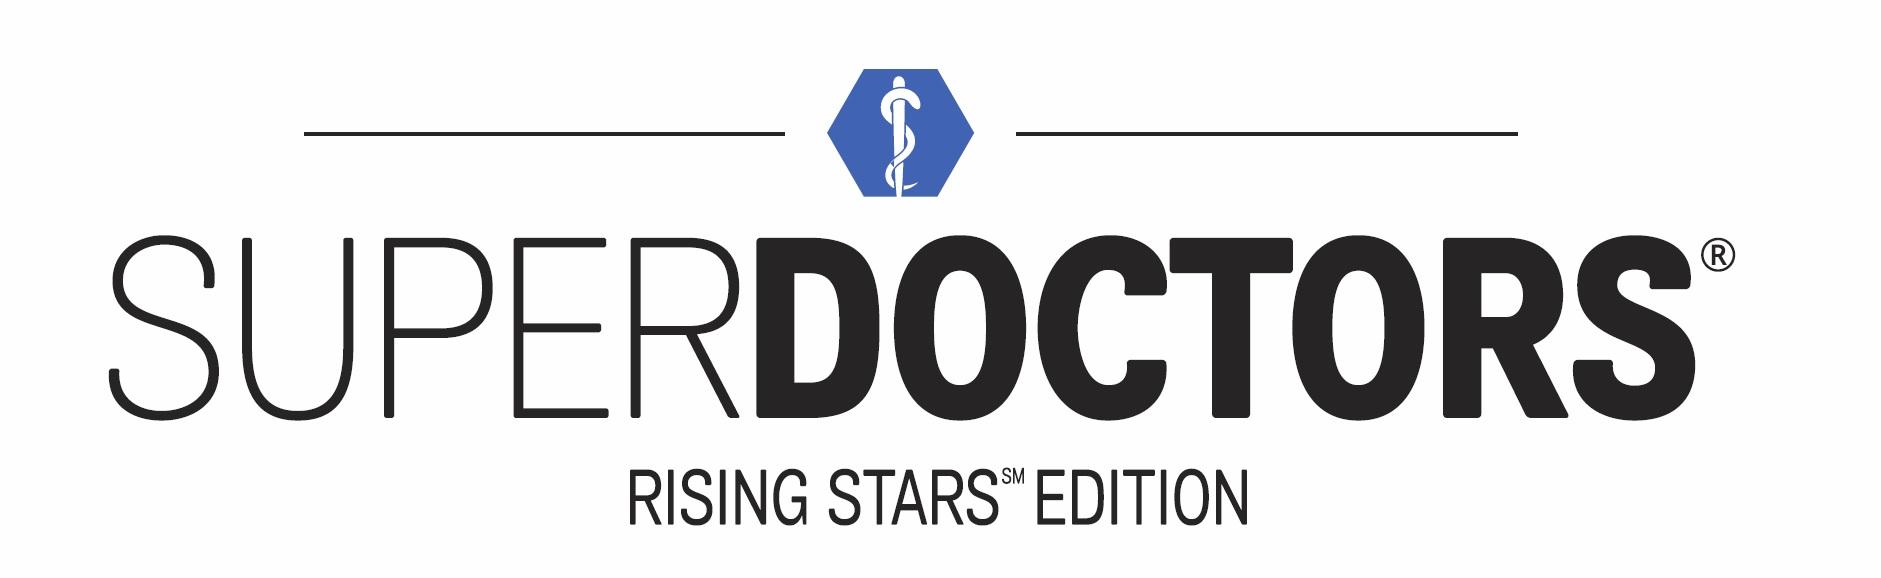 Image result for super doctors rising stars